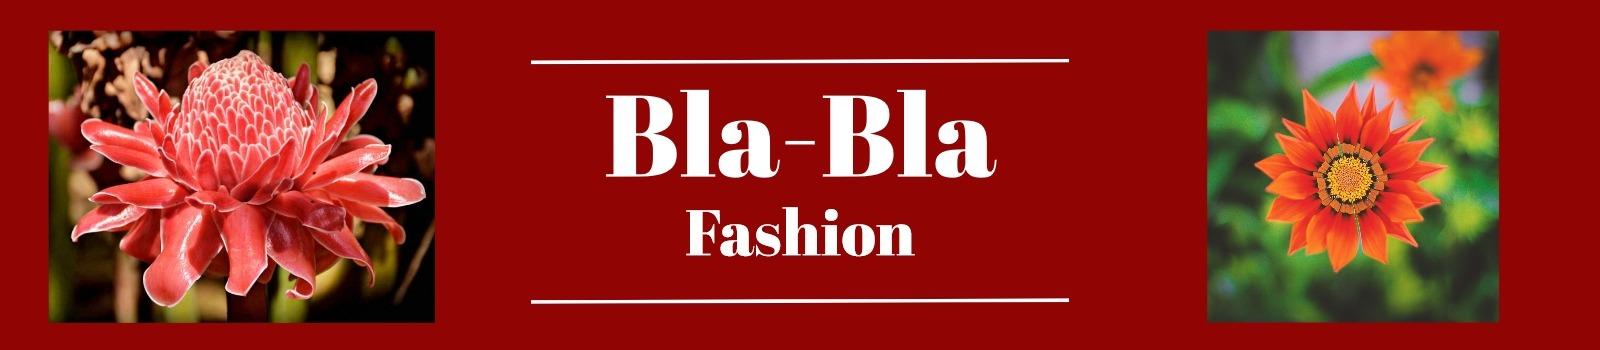 Bandeau Bla-Bla vetements, collection 2021, www.LaTribu.shop(1)